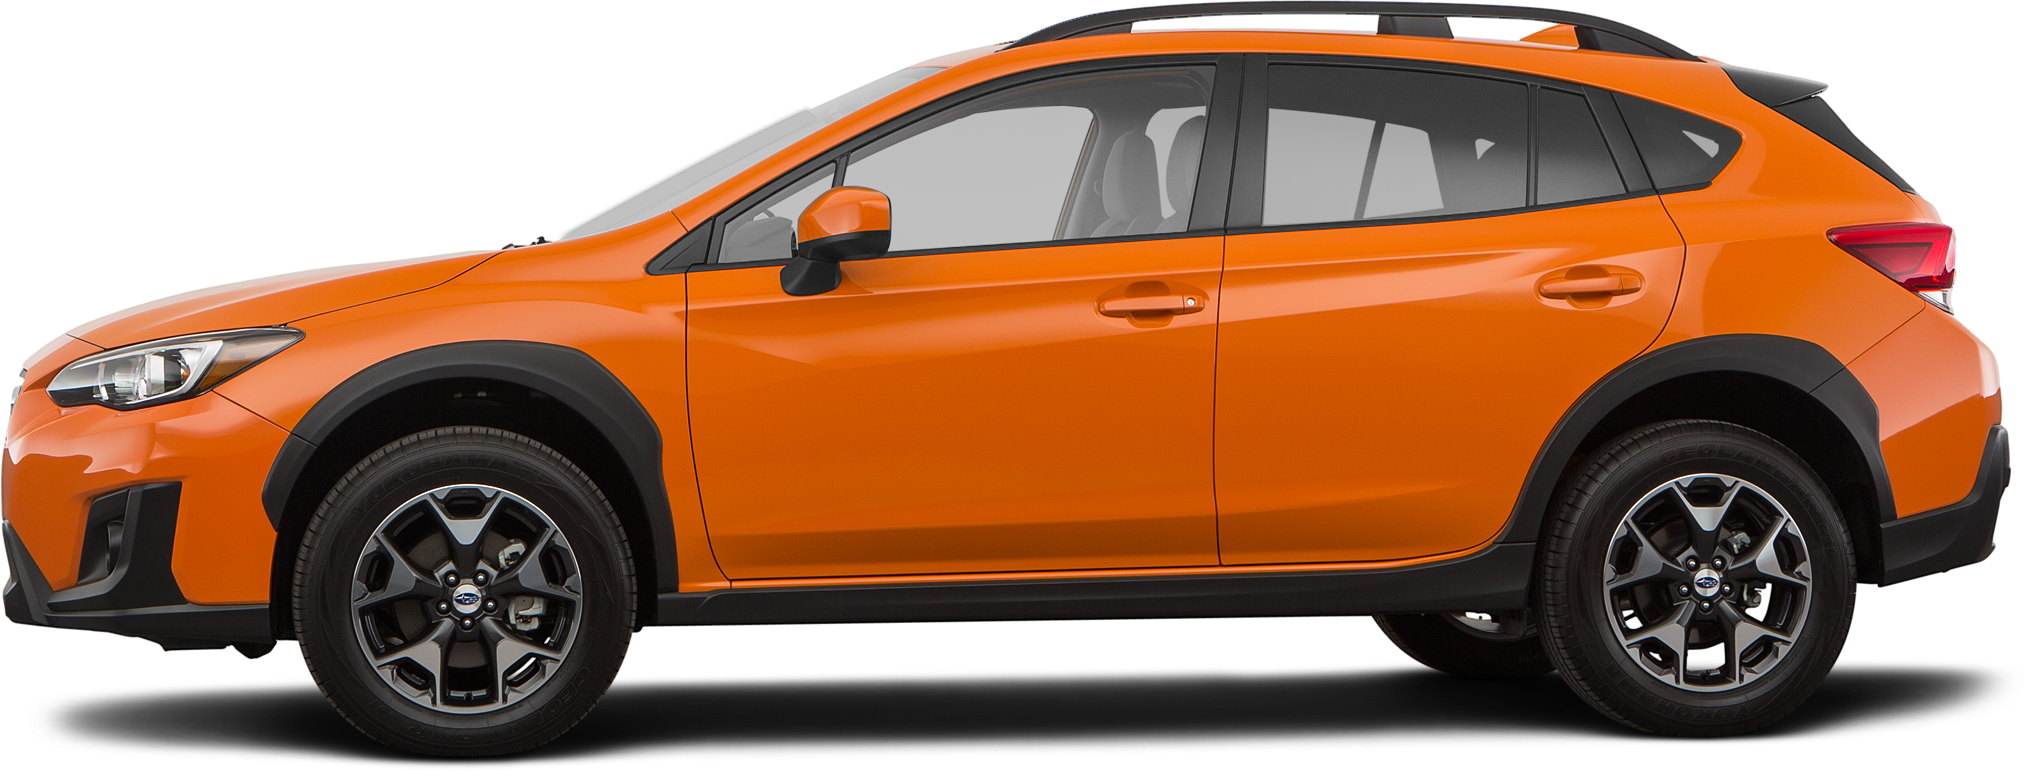 2019 Subaru Crosstrek SUV 2.0i Premium